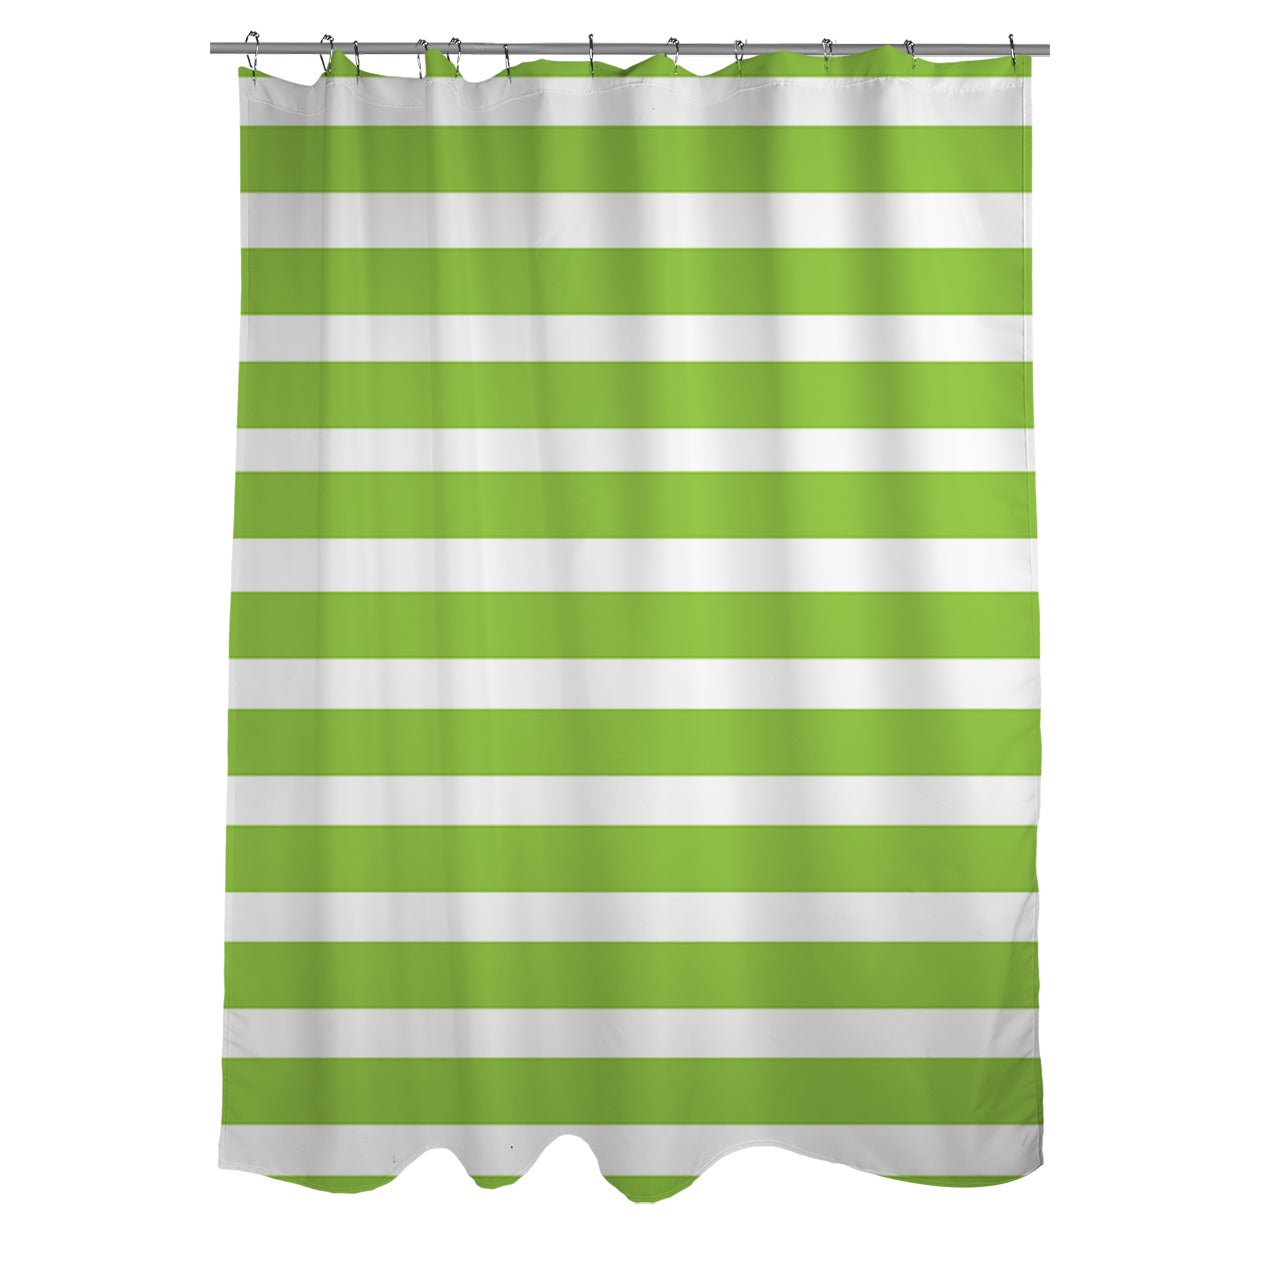 Shop Bright Stripes Kiwi Shower Curtain - On Sale - Free Shipping ...